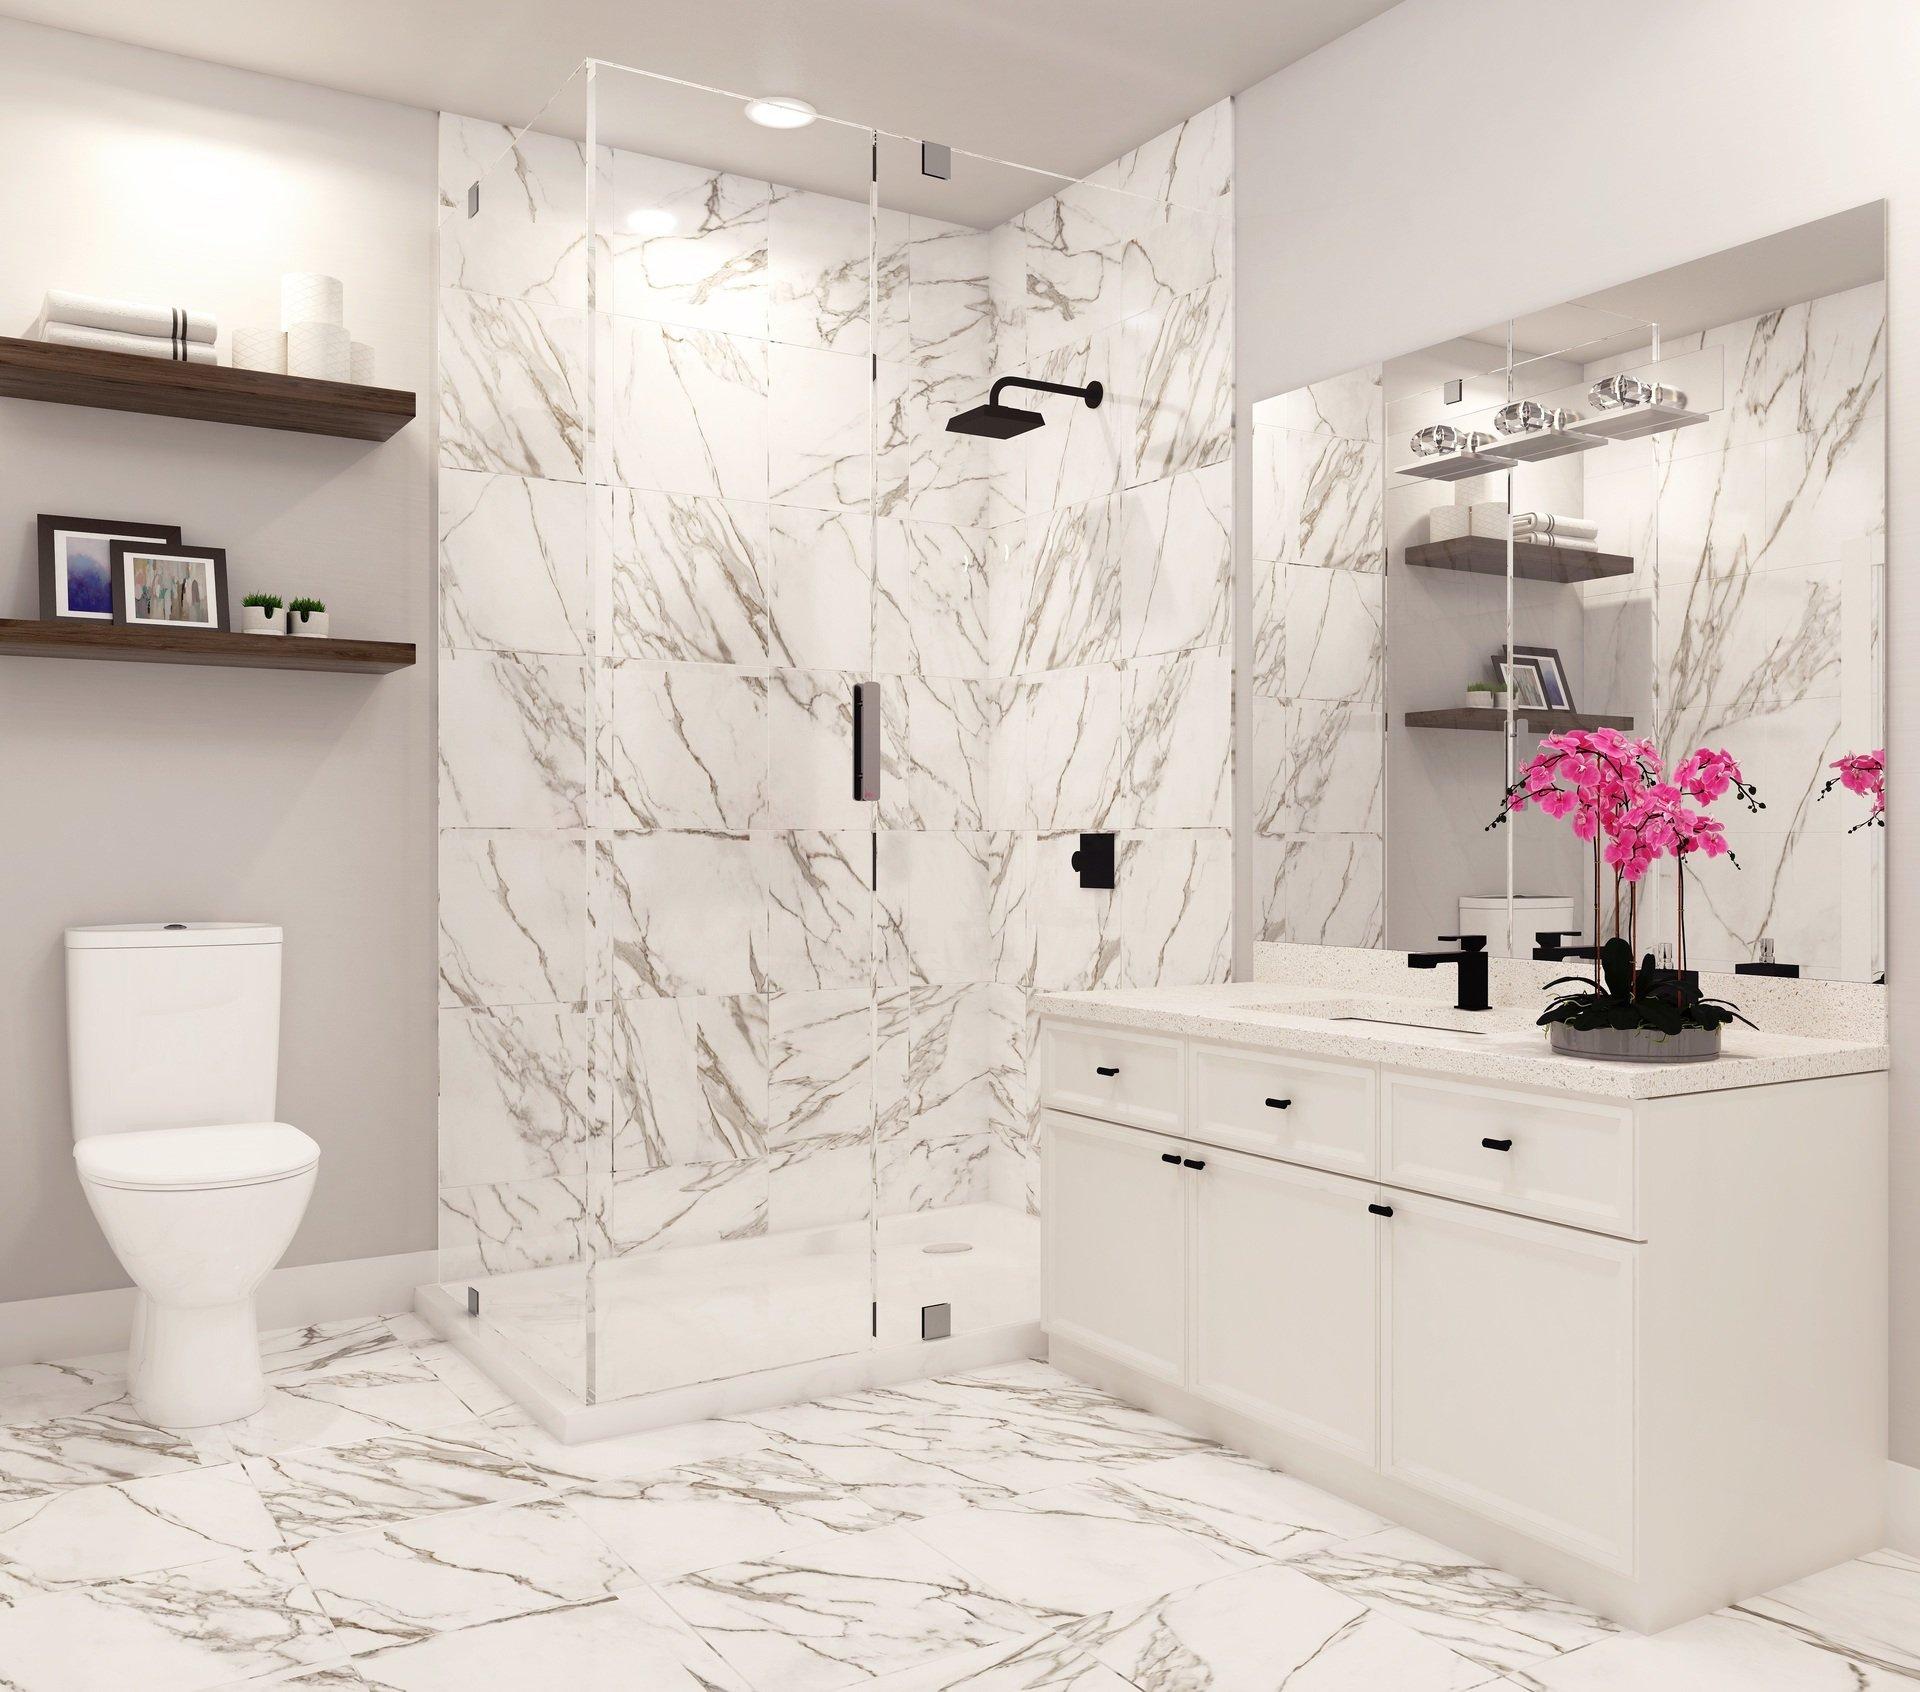 Bathroom - 19624 56 Ave Langley City, BC V3A 3X6 Canada!